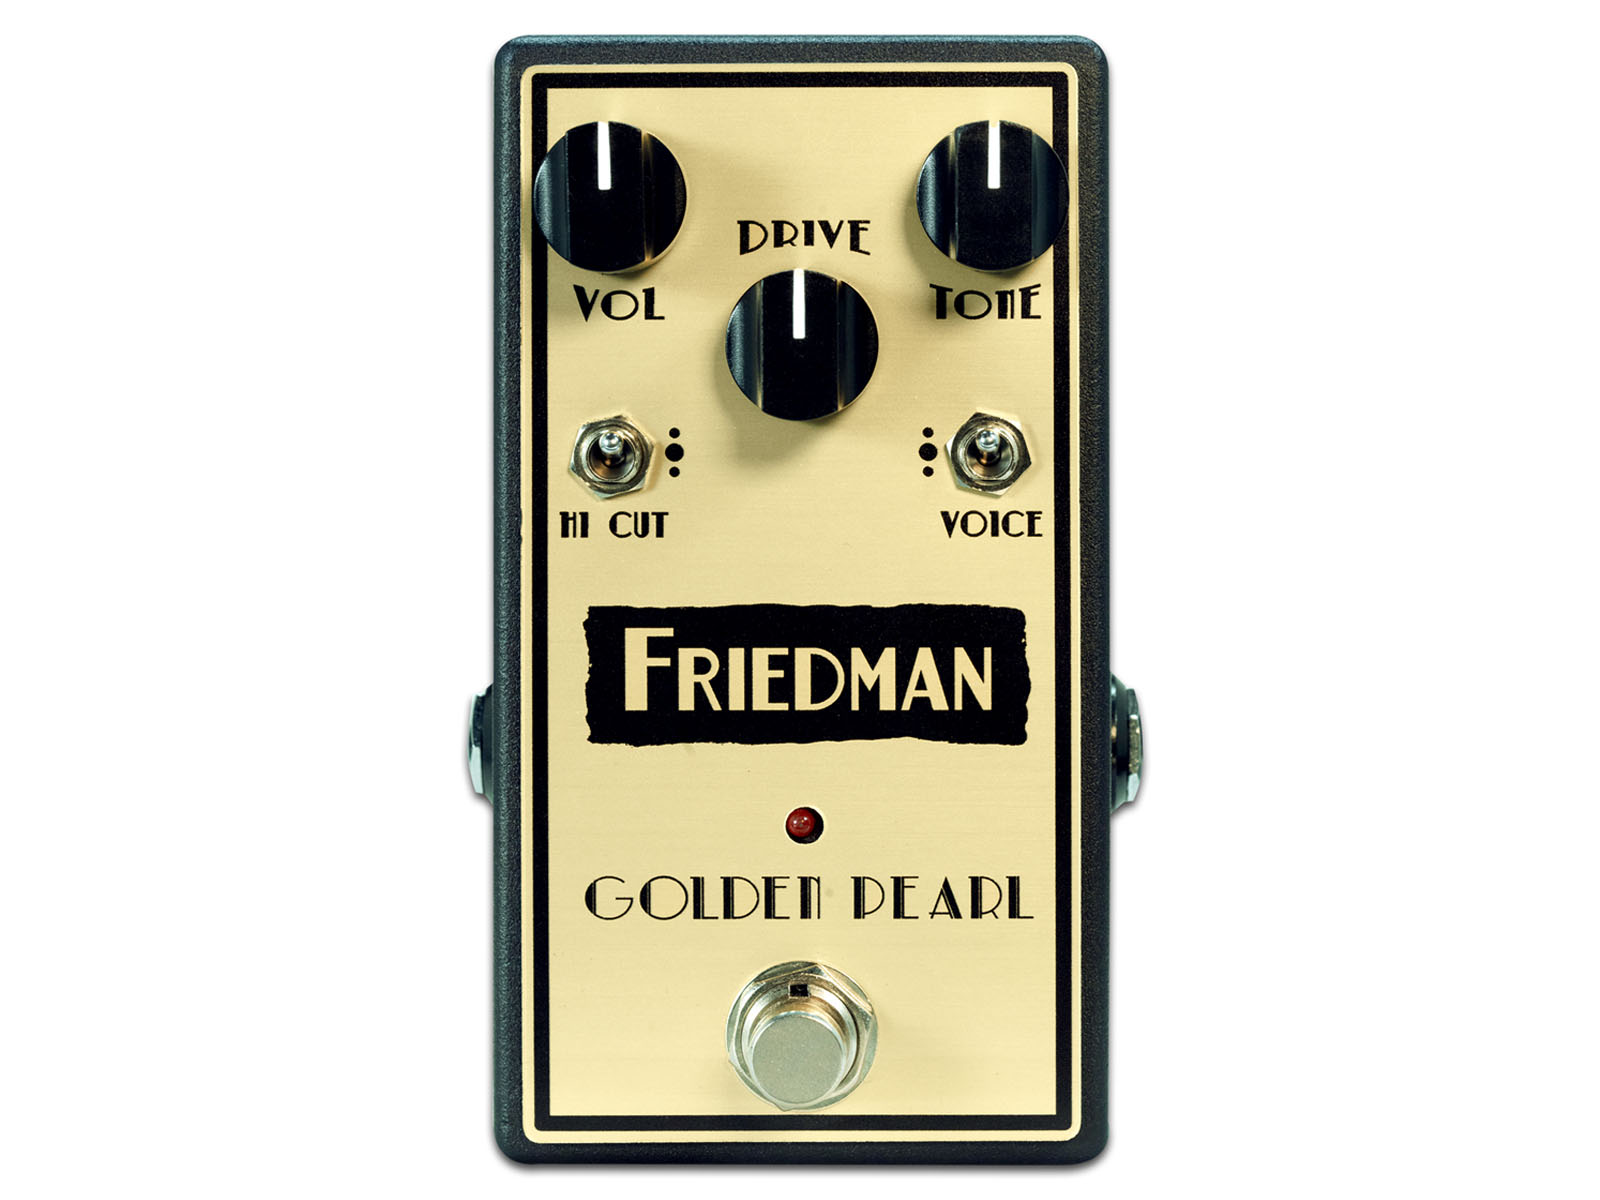 Friedman_GoldenPearl_top_1600x1200